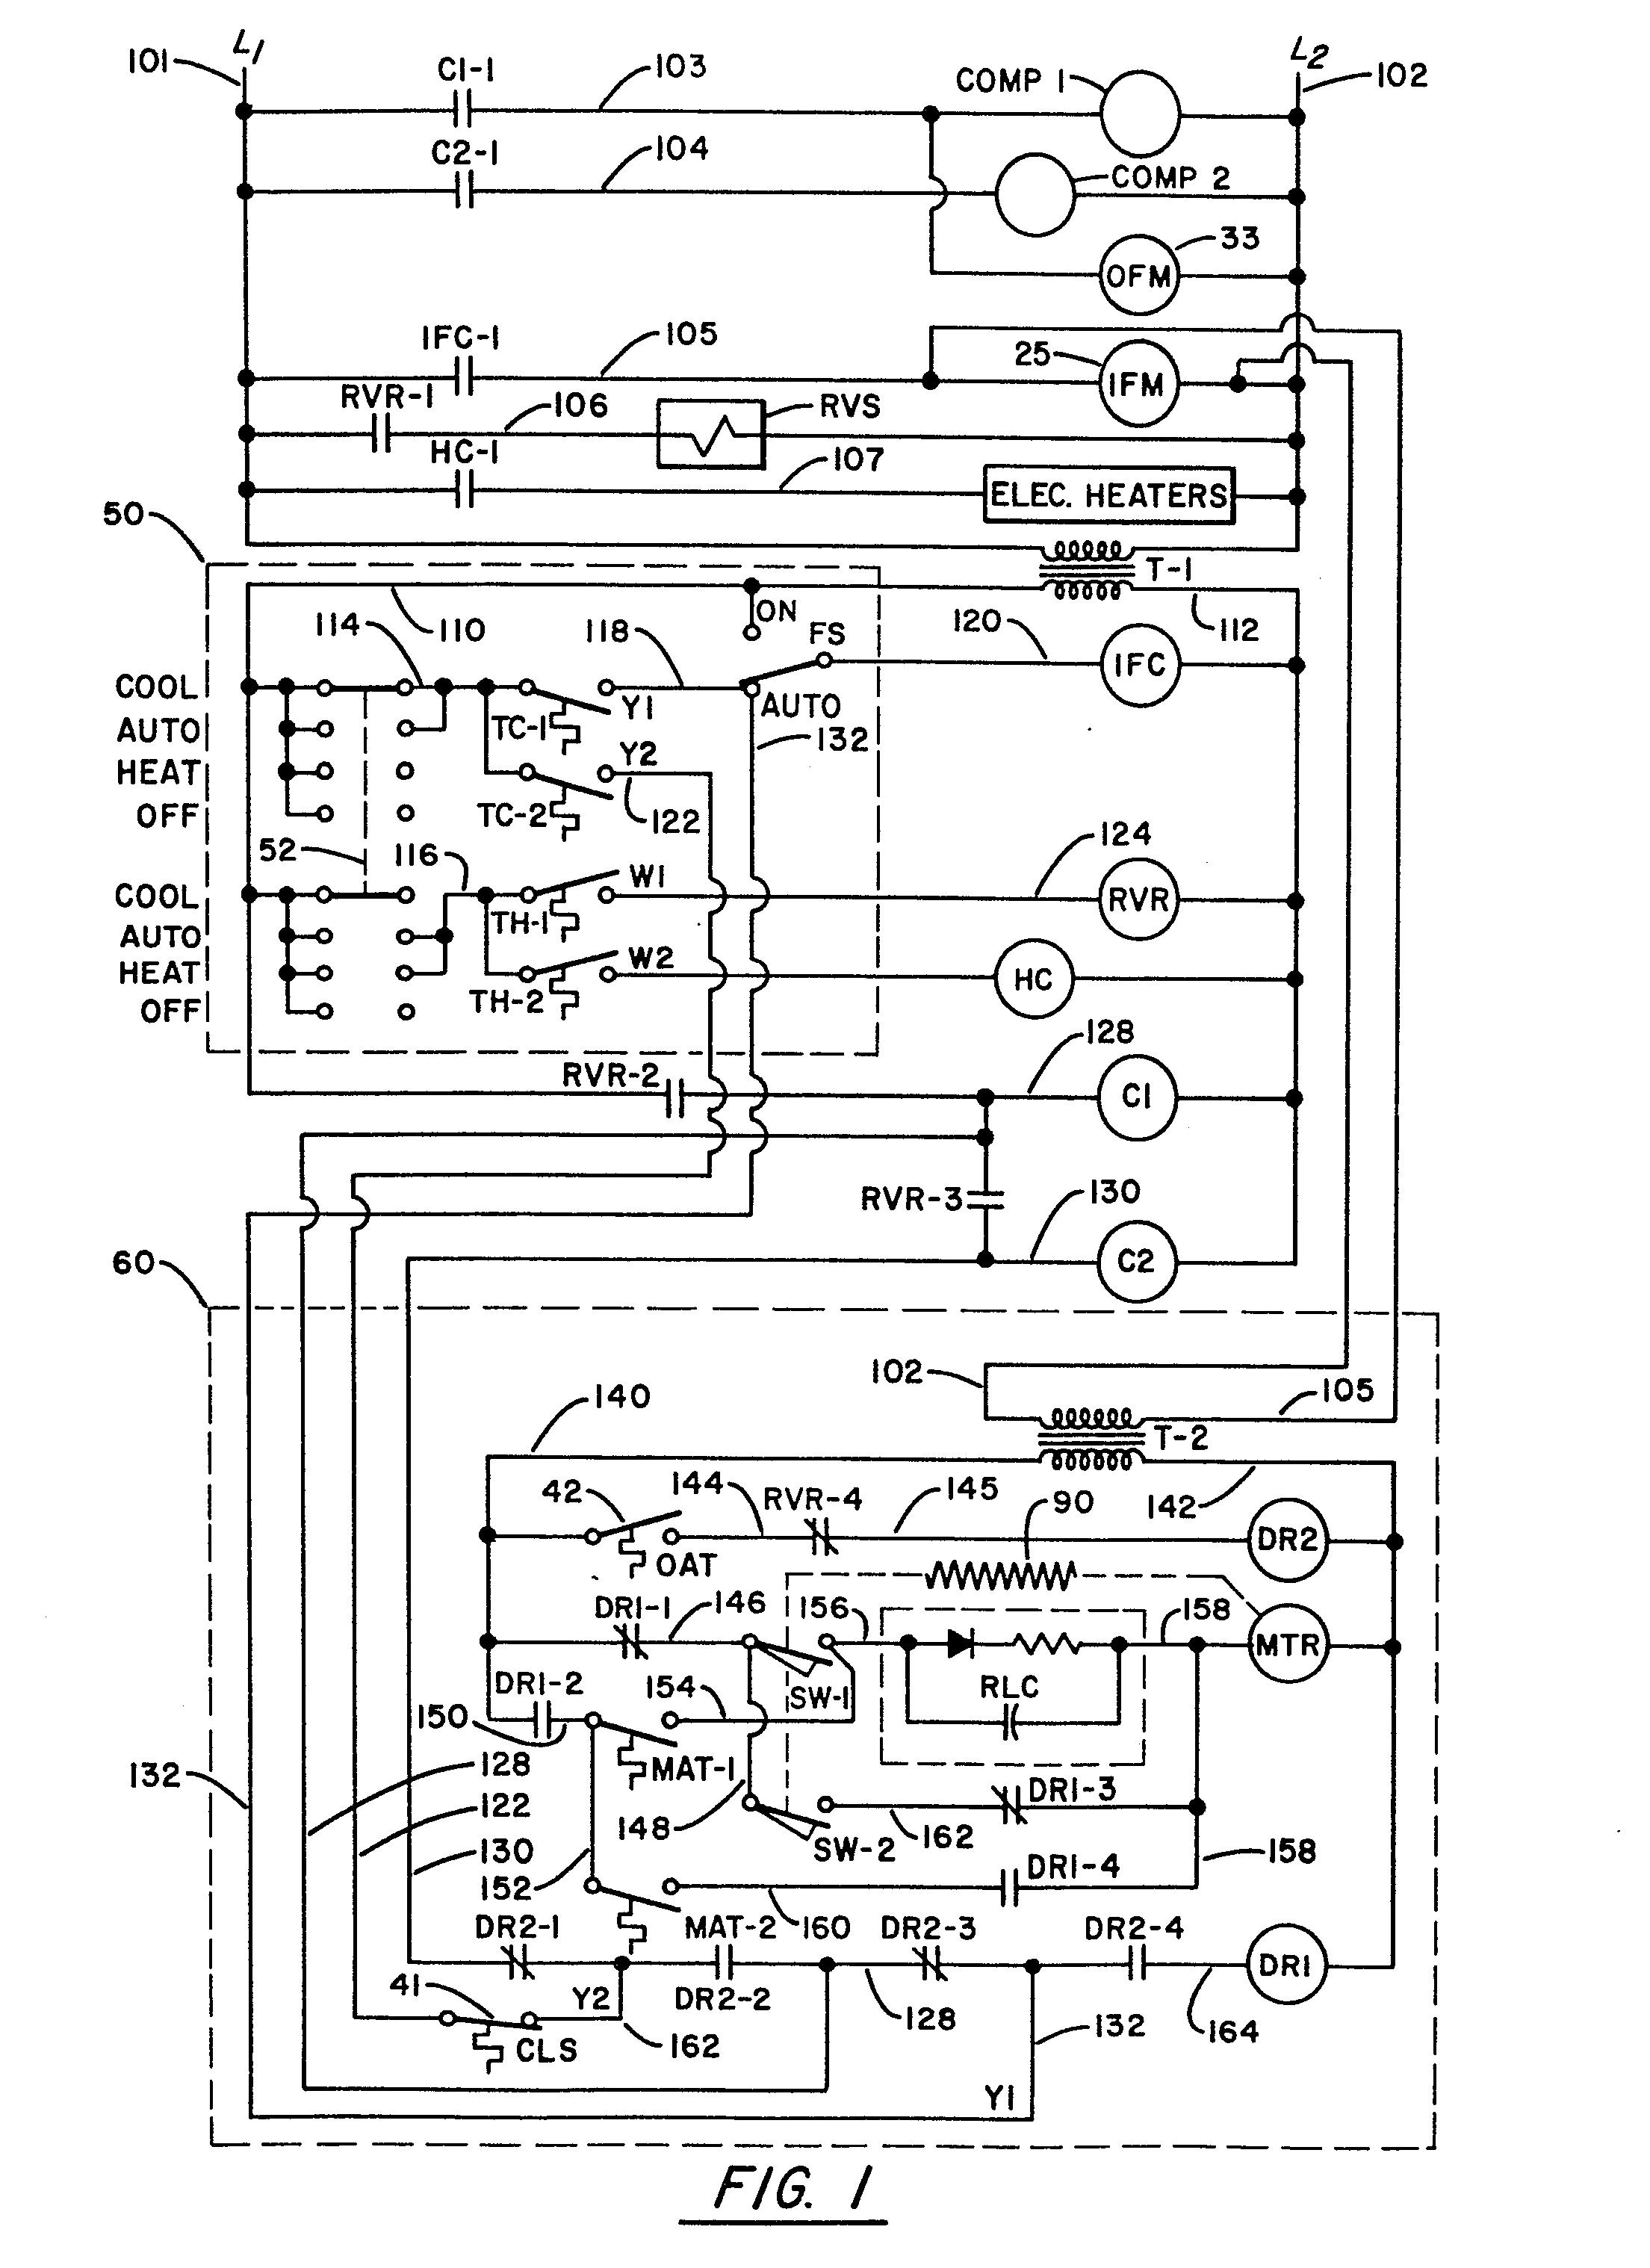 rkkg_6203] trane xl14i wiring diagram diagram database website wiring  diagram - stratocasterdiagram.think-med.es  diagram database website full edition - think-med.es